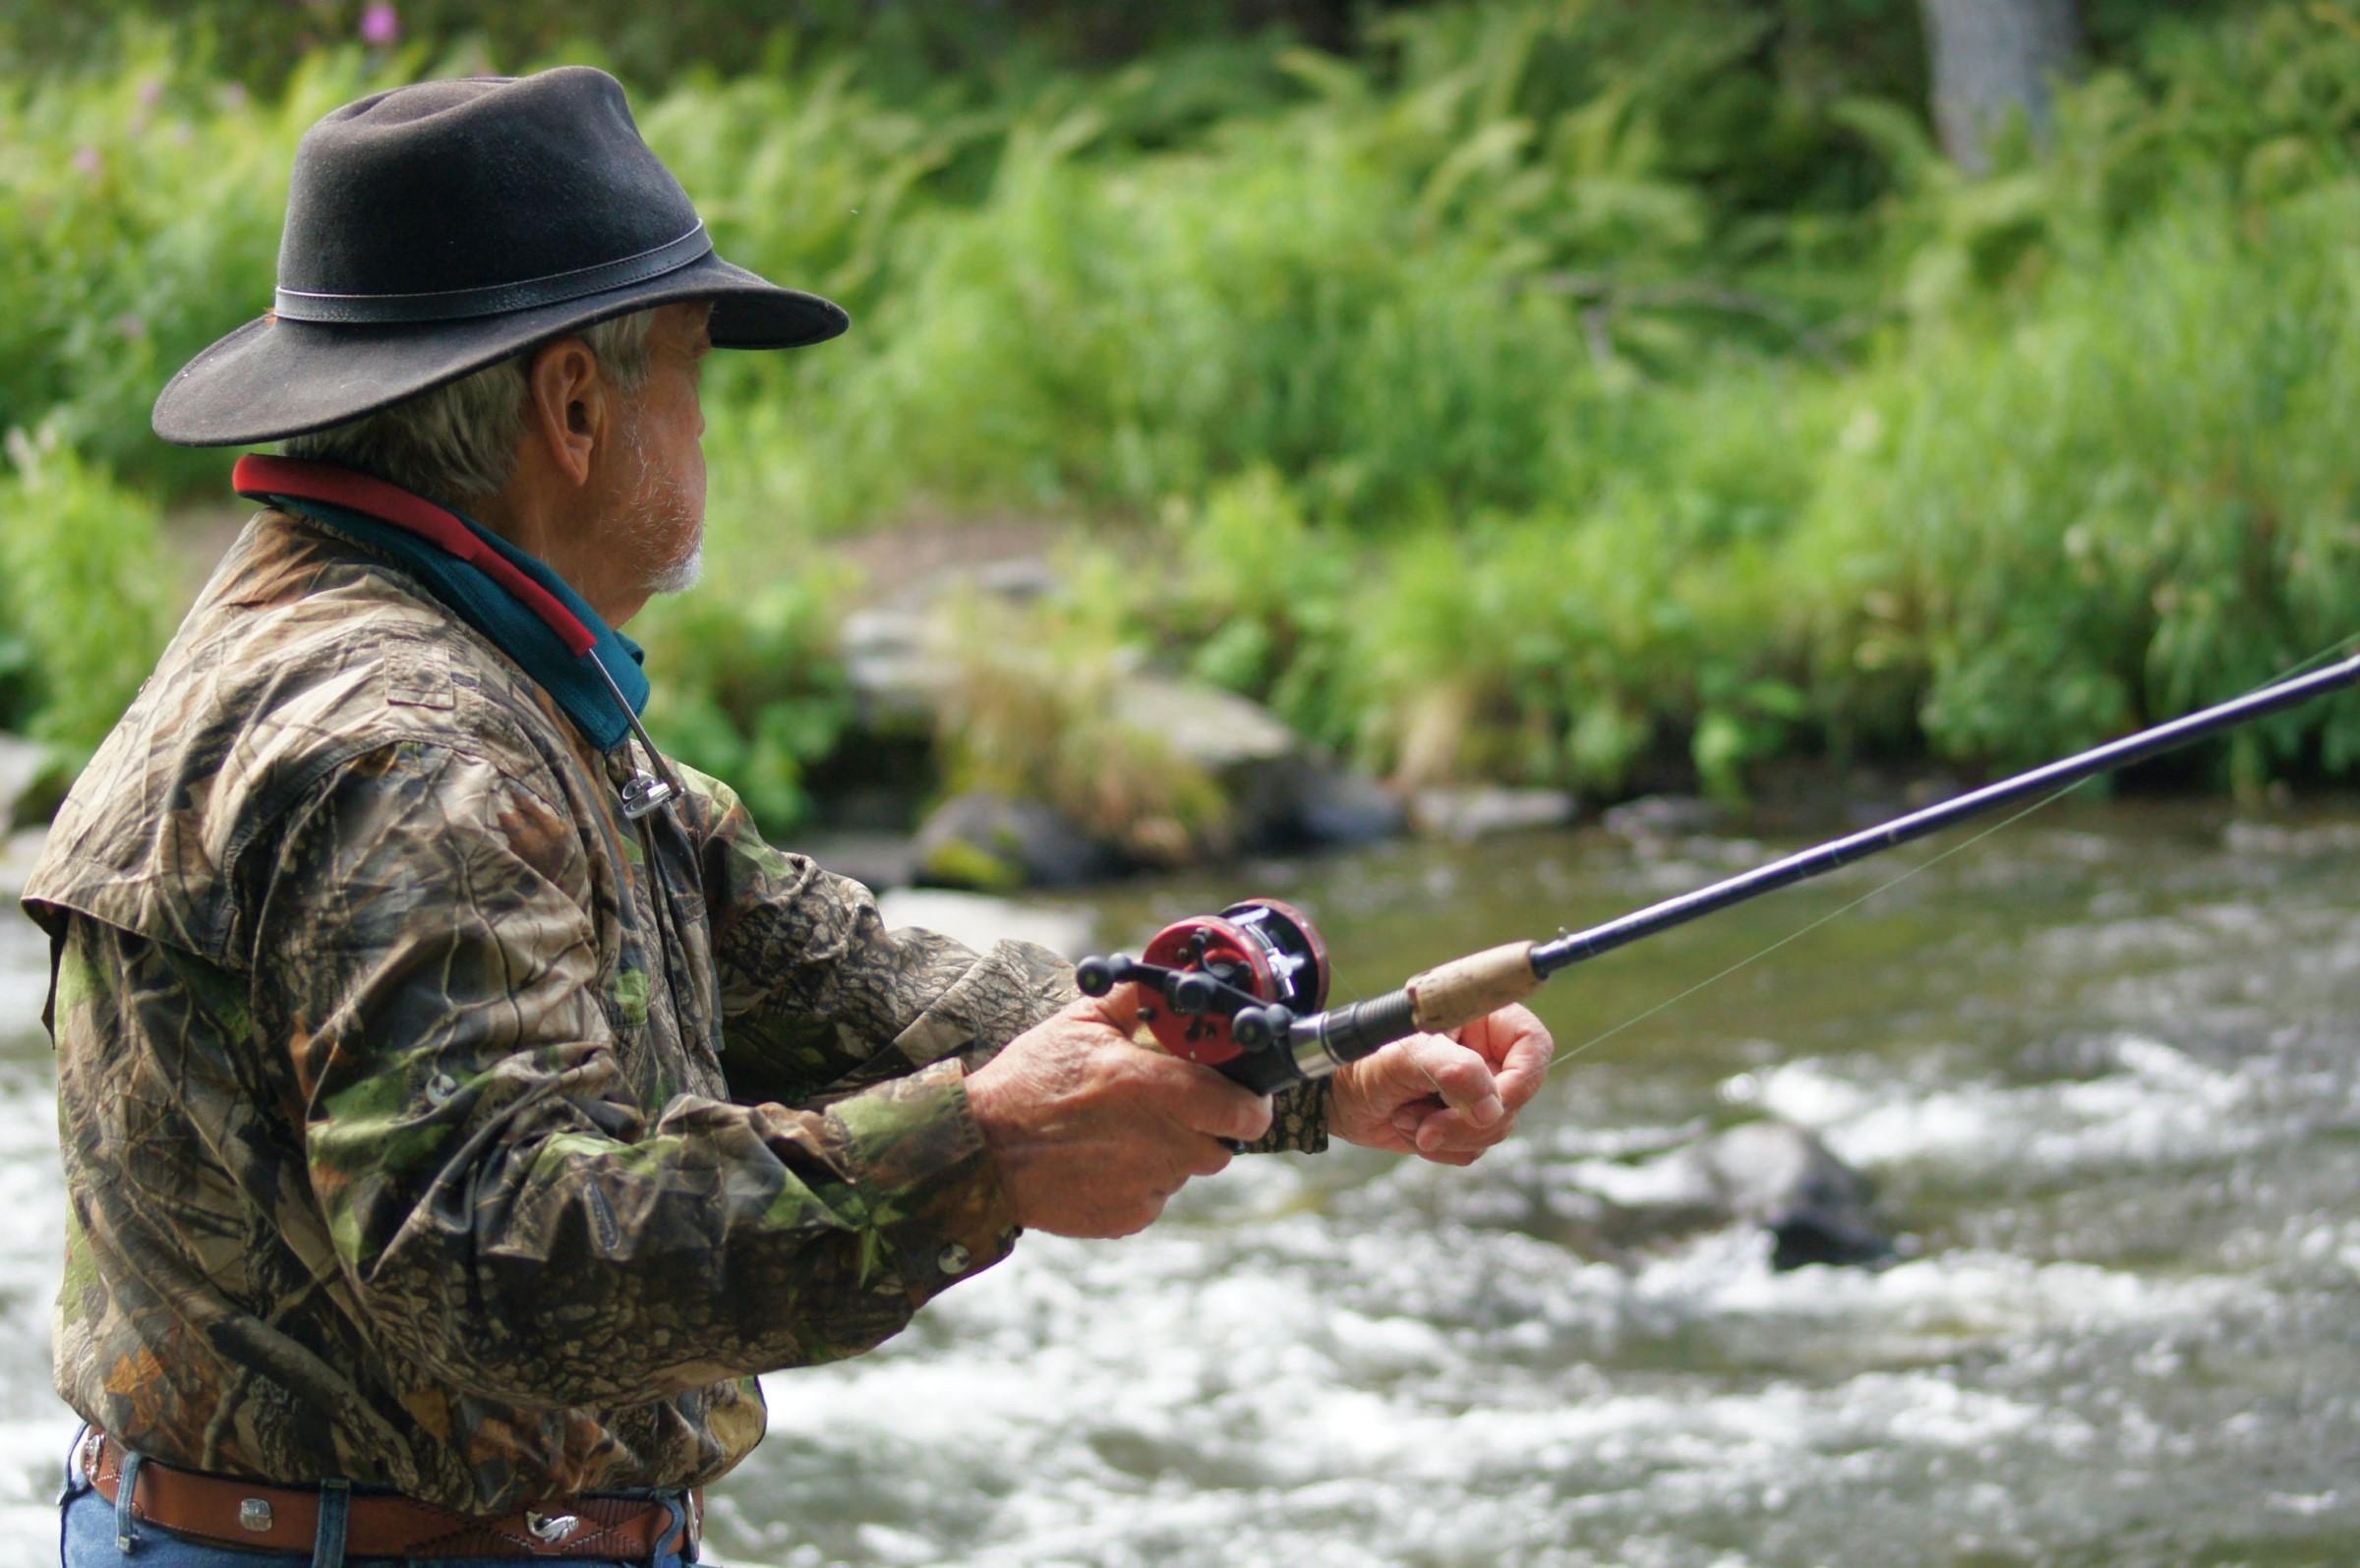 River fishing in Alaska